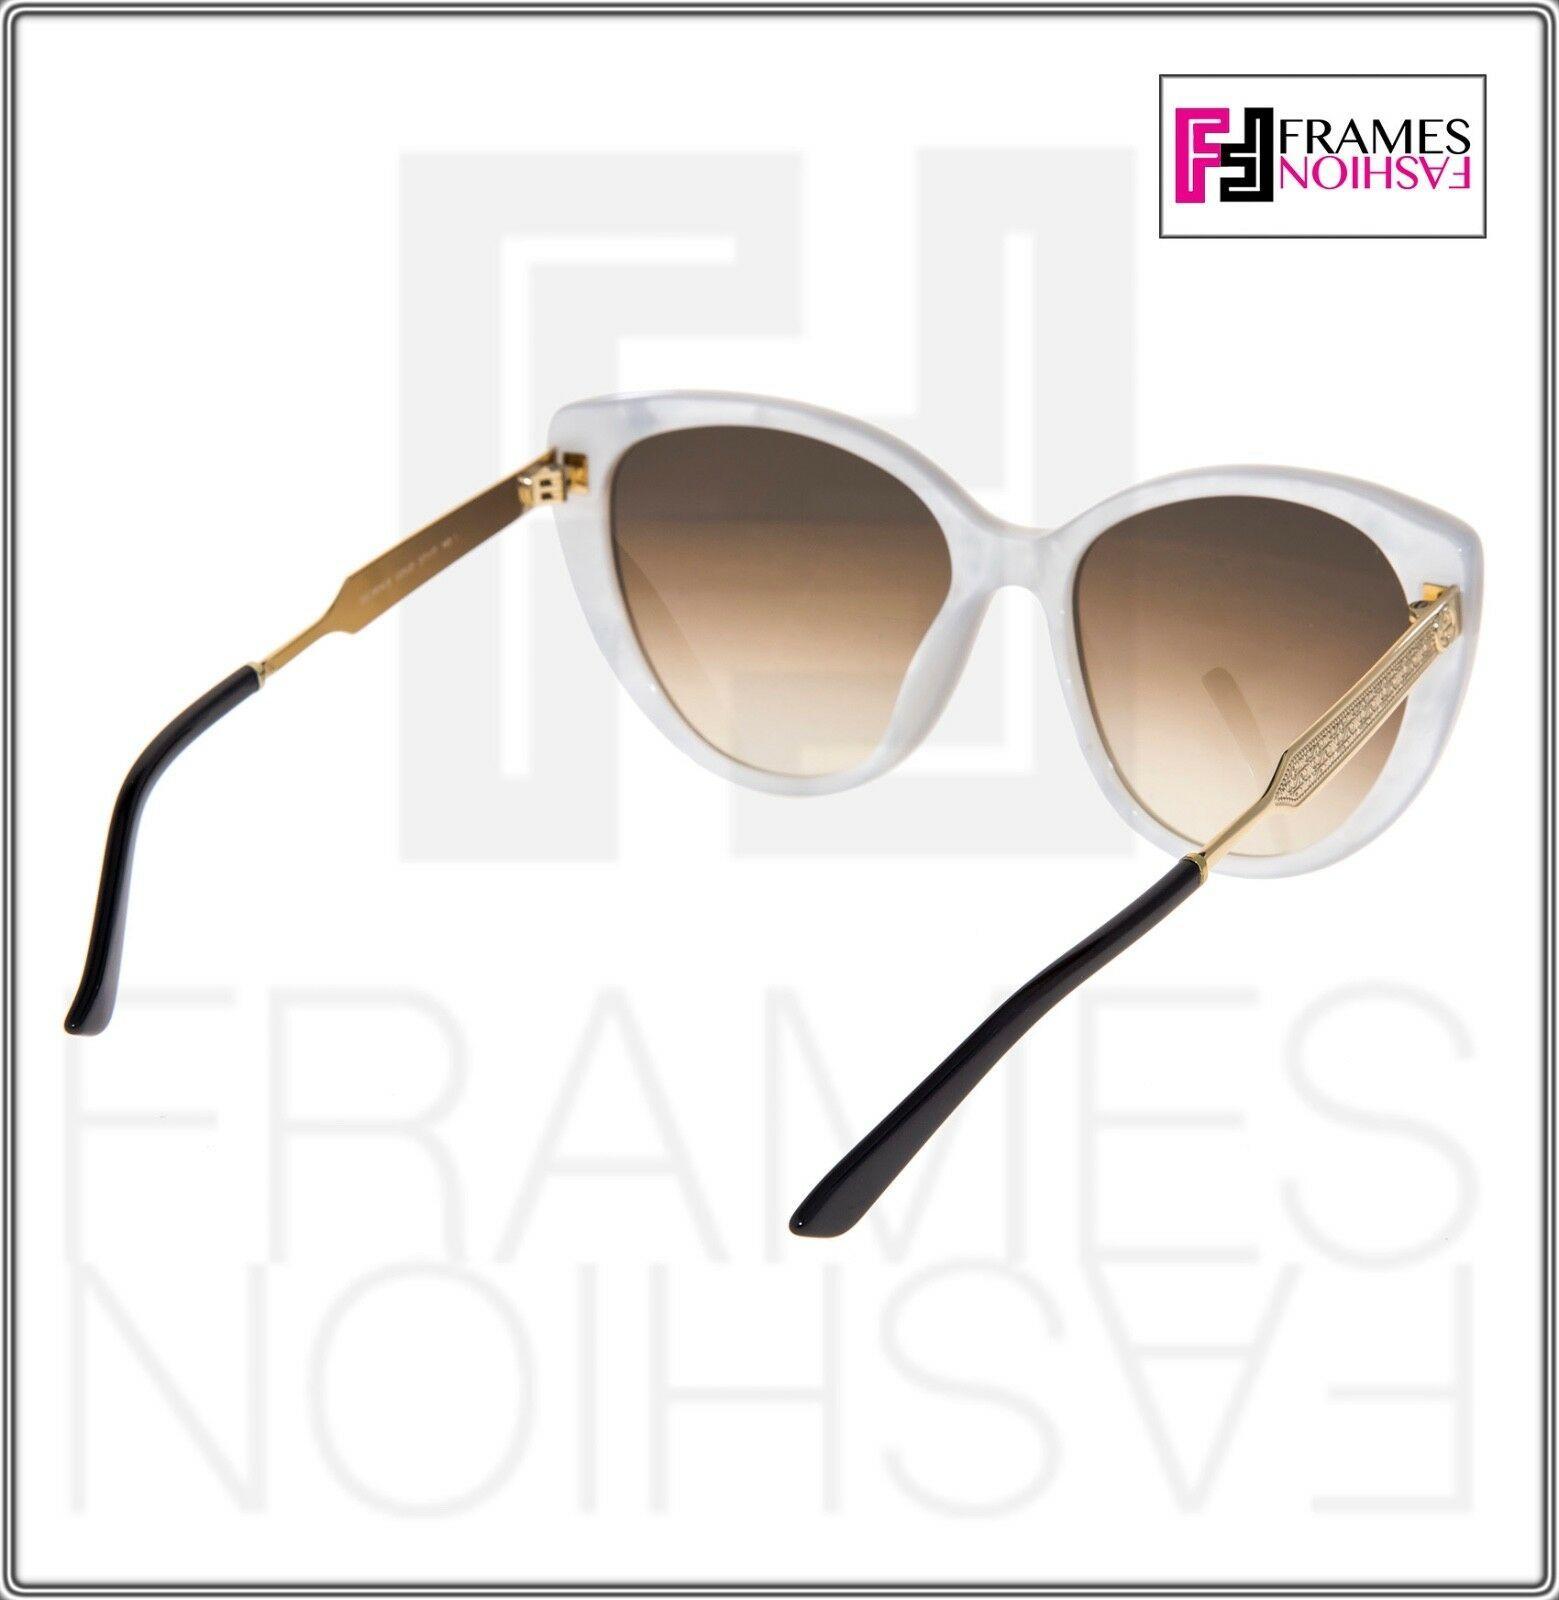 5e28dbbf9c4 GUCCI GG3804S DAMASCATO Mother of Pearl Gold White Cat Eye Sunglasses 3804